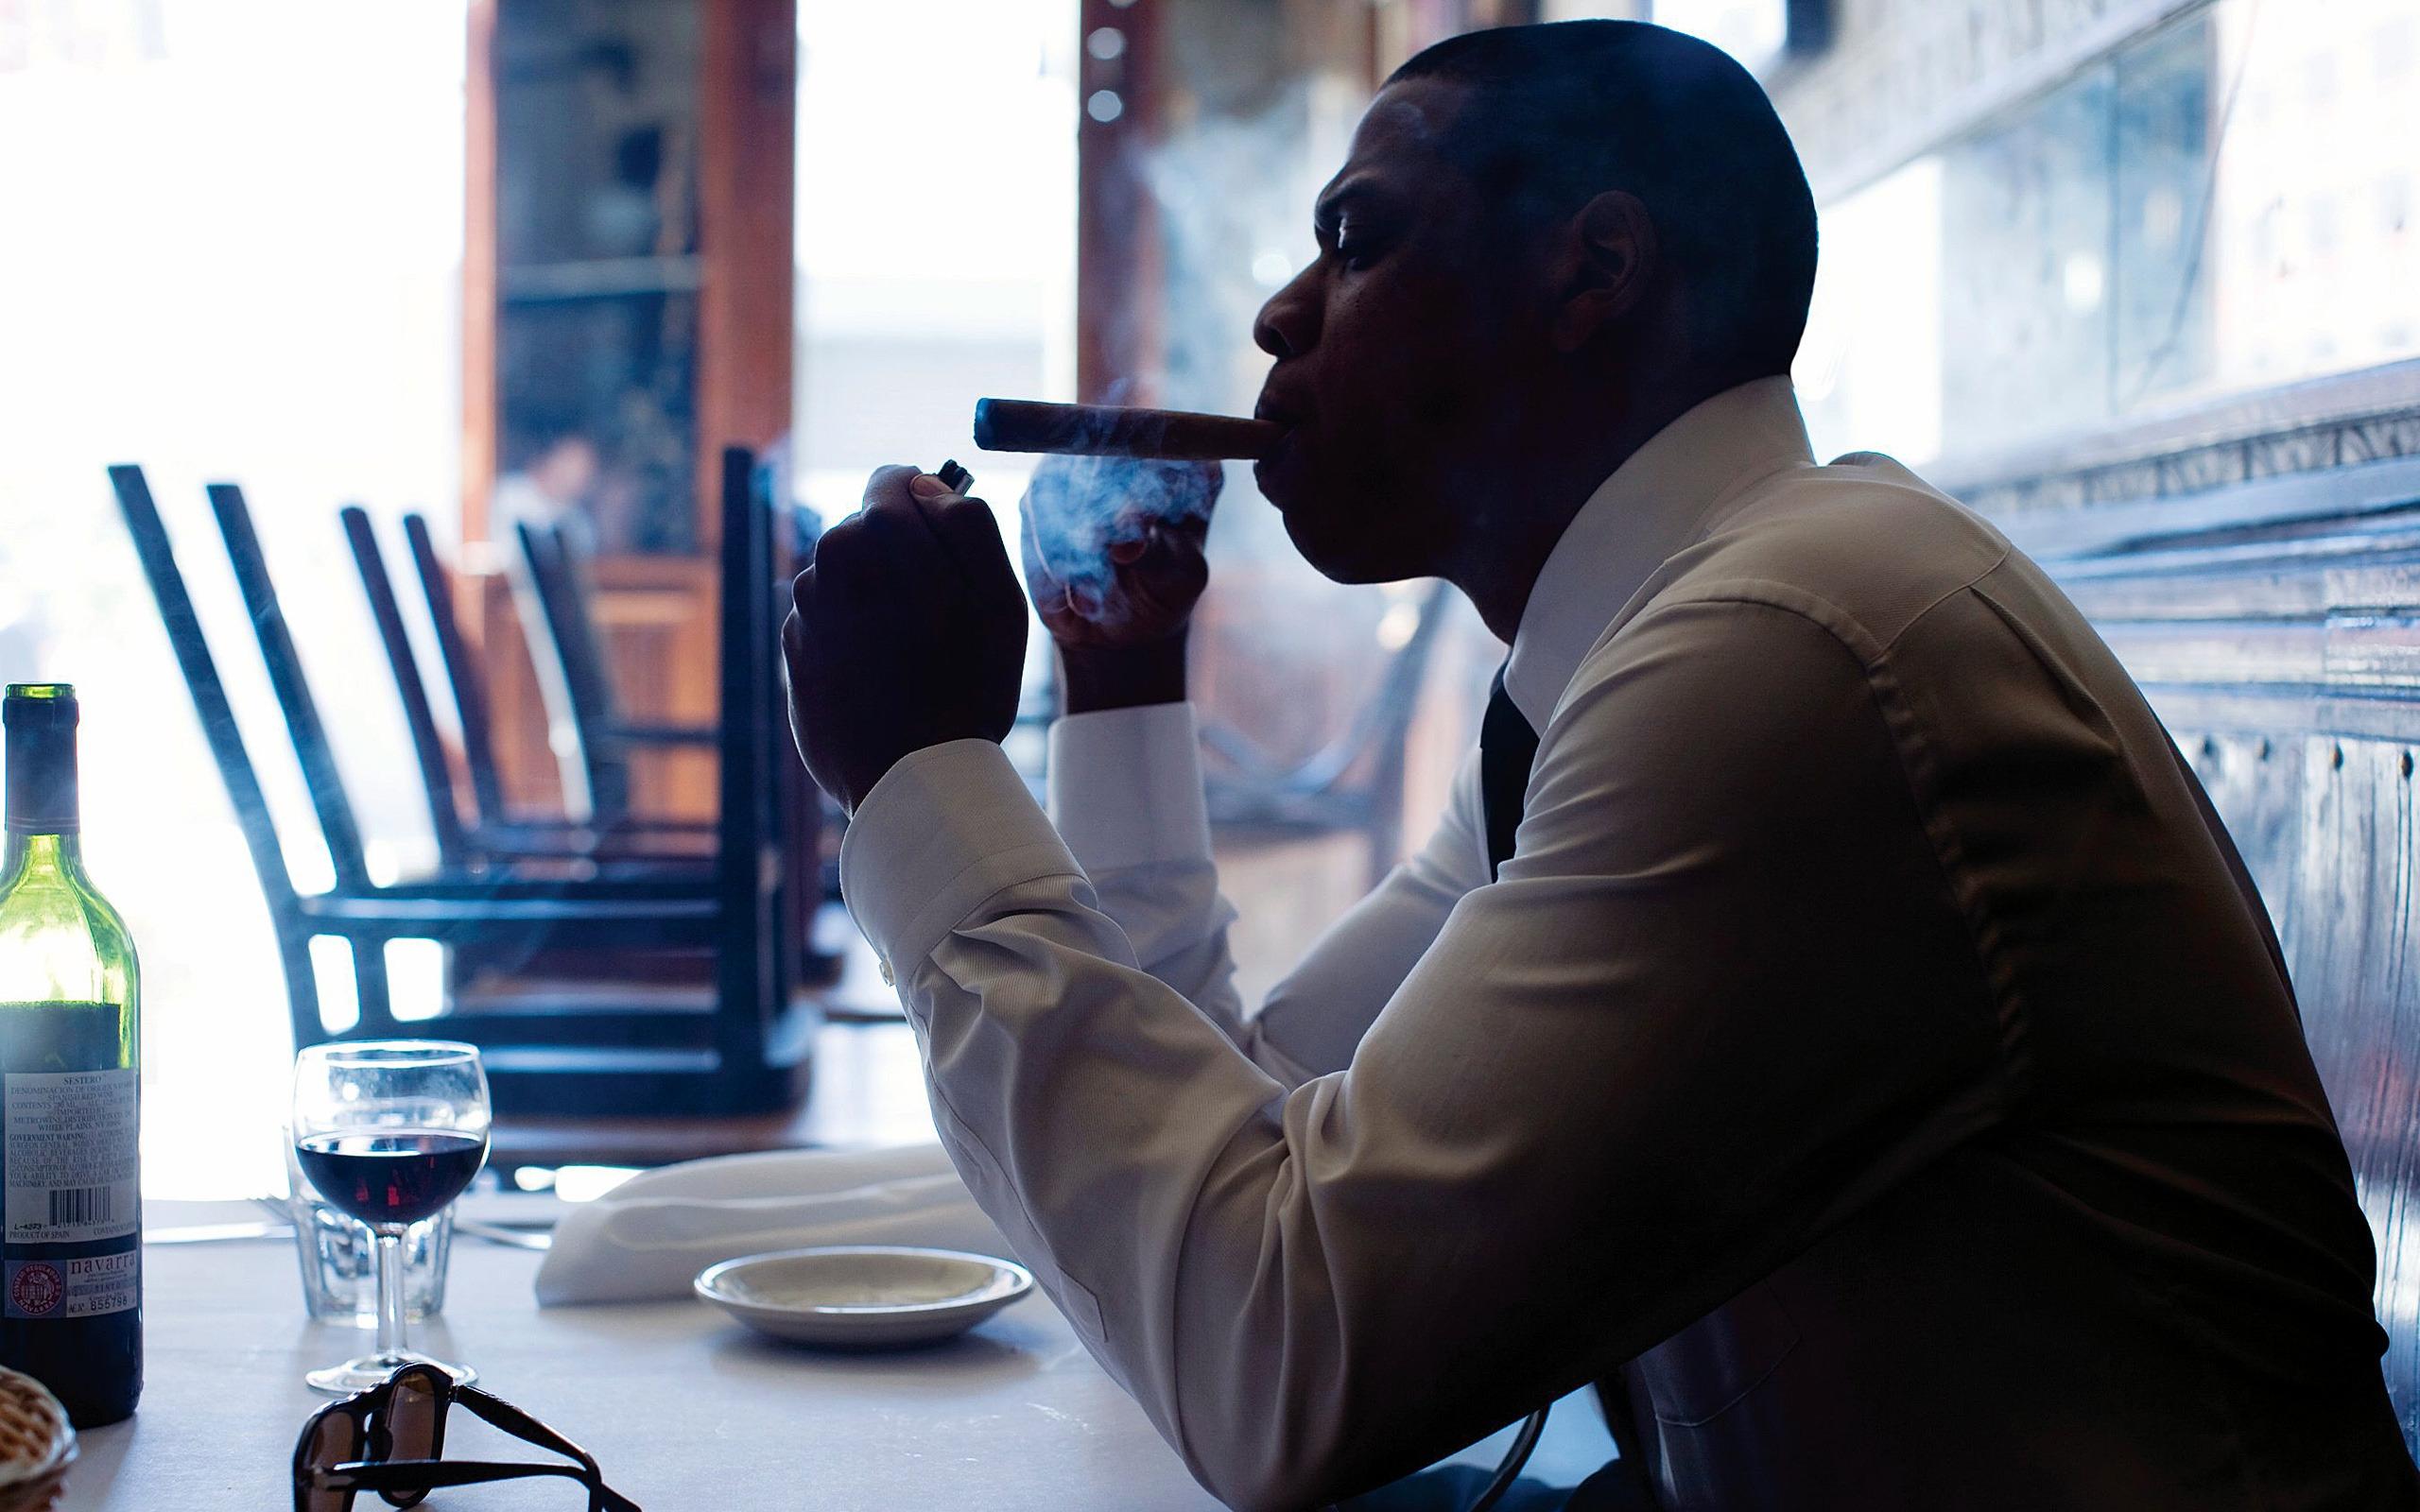 Jay Z Smoking 2560 X 1600 Widescreen Wallpaper